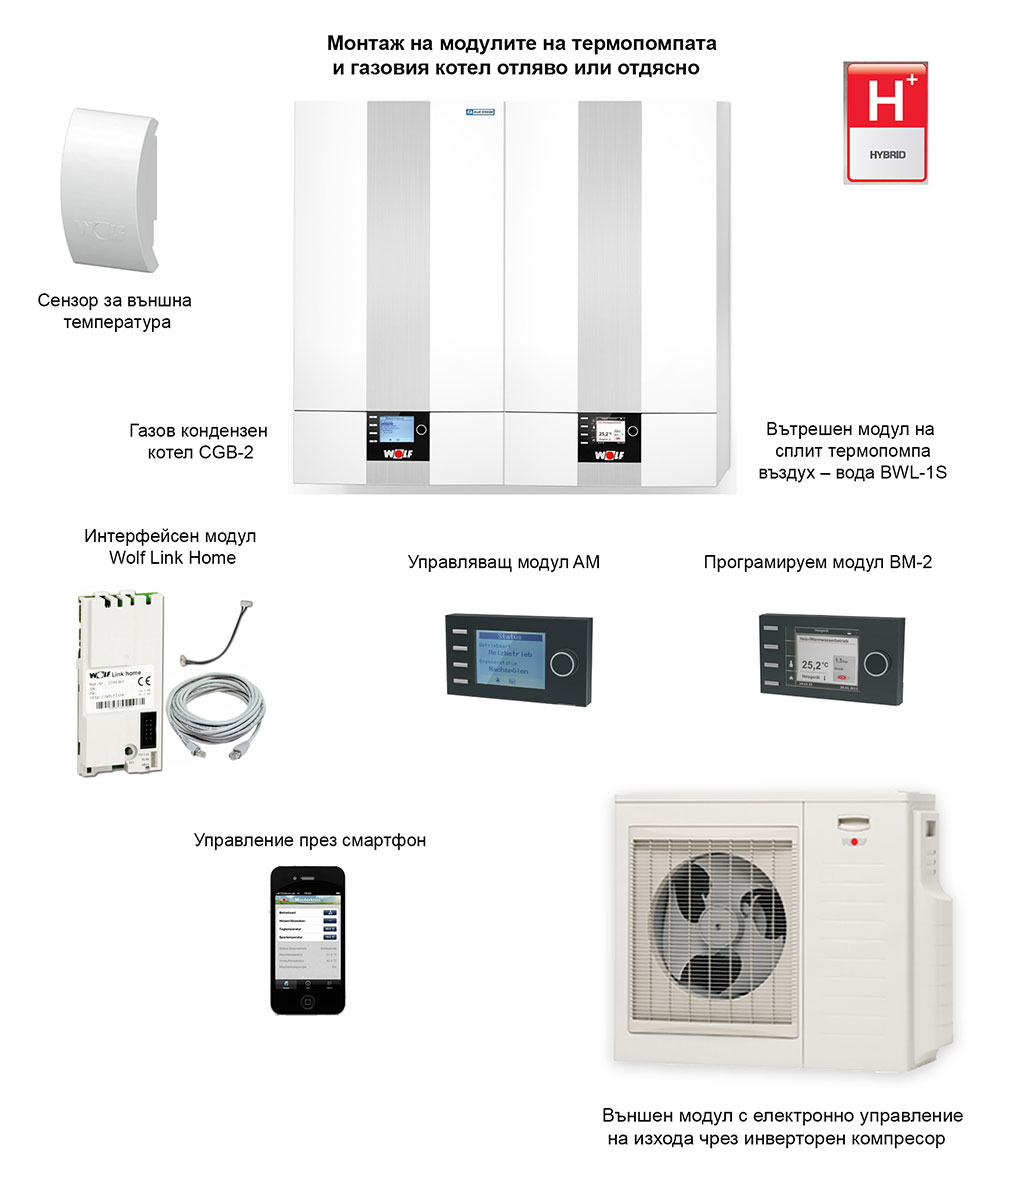 Hybrid_heating_system